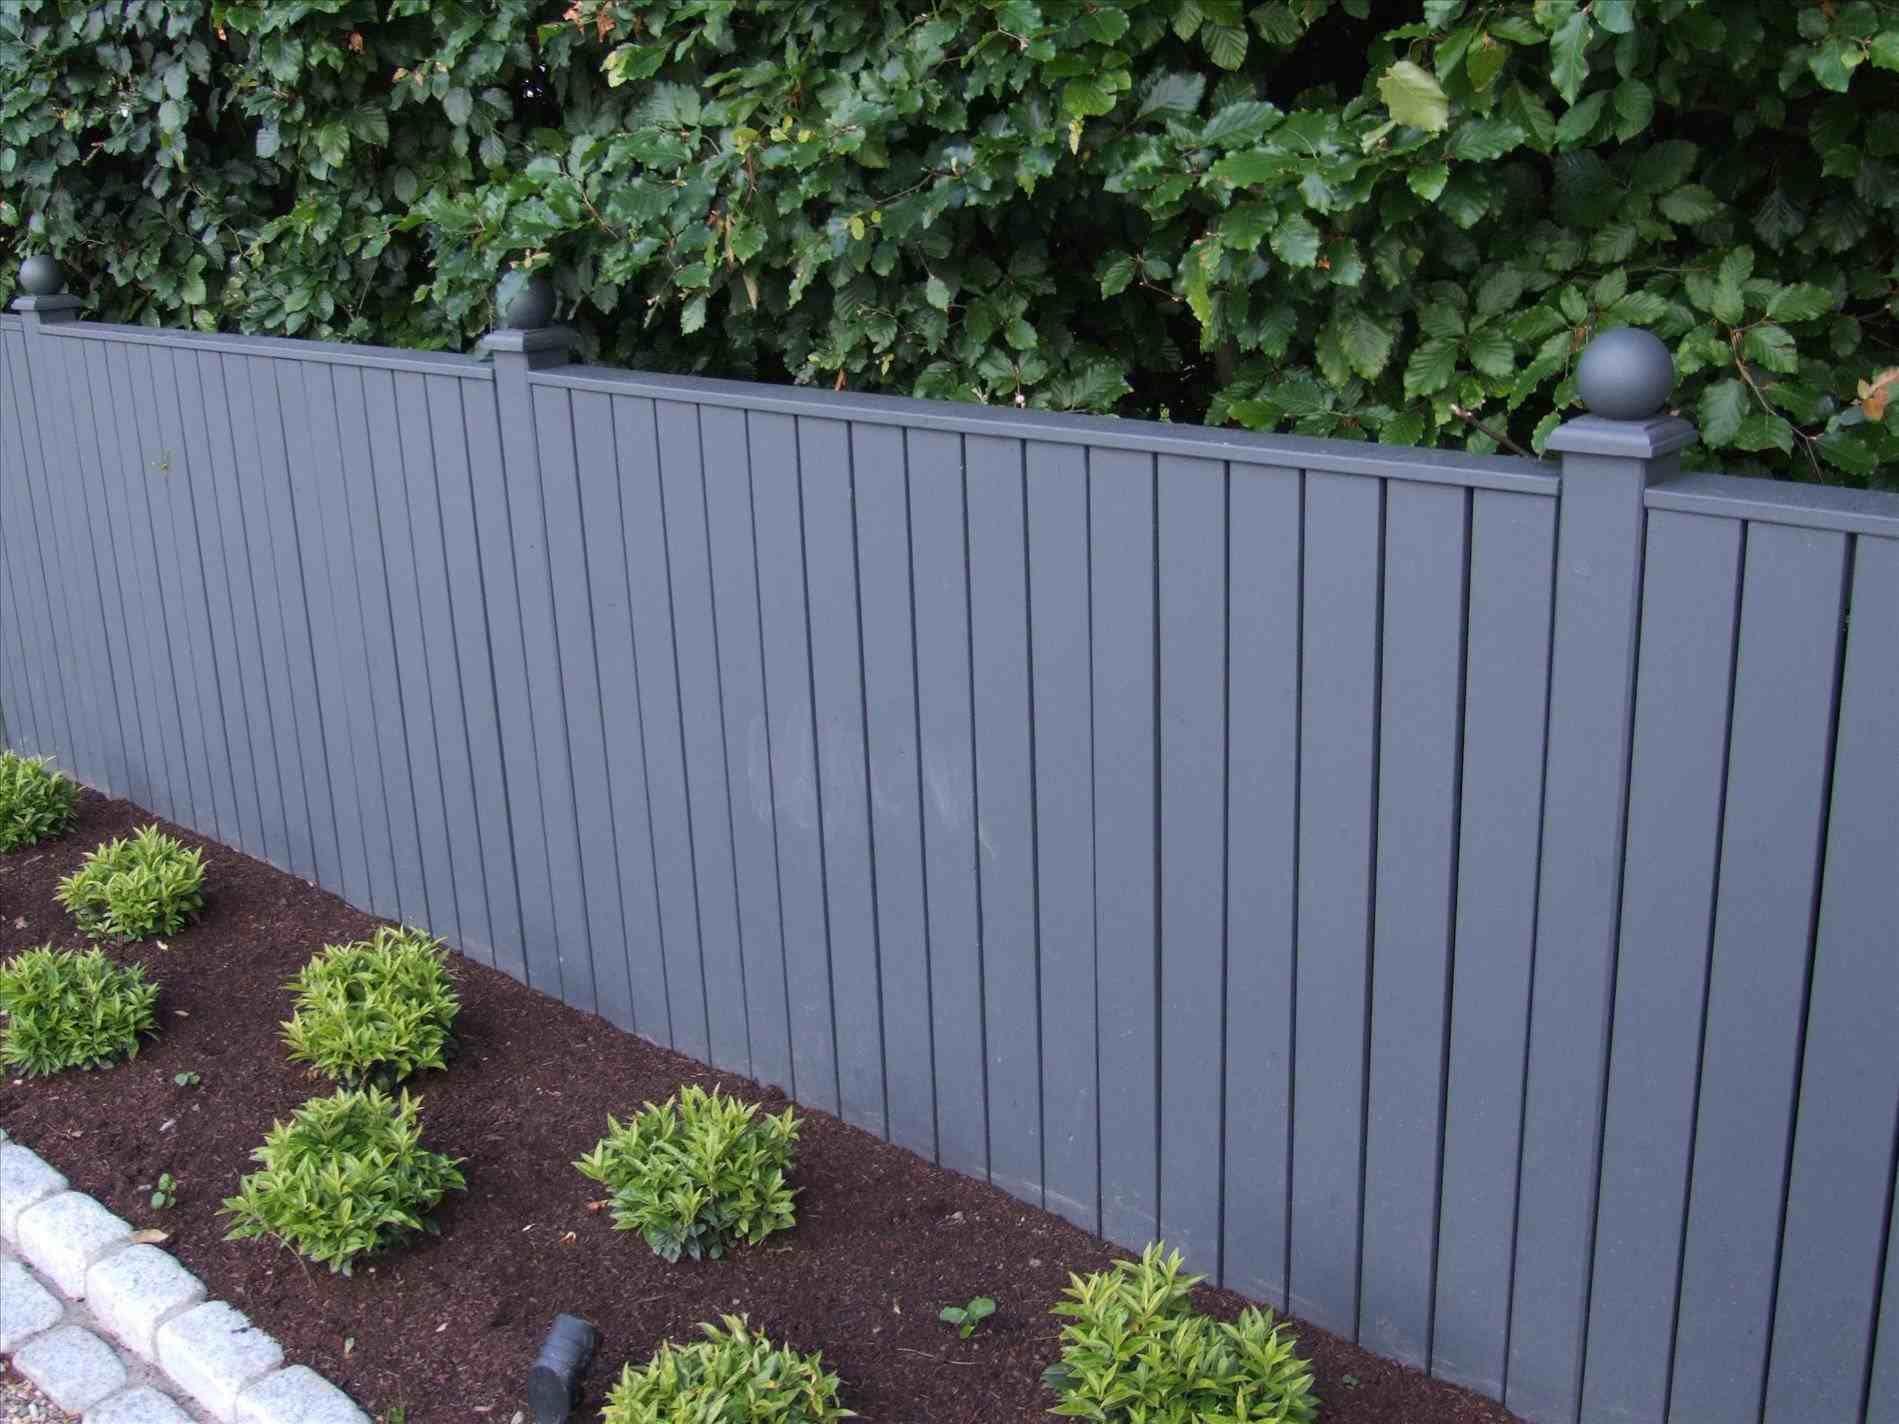 Backyard Fence Paint Colors Can Do For Your Block Tukee Garden How To Apply It Garden Backyard Fence Painting Garden Fence Paint Backyard Fences Garden Fence